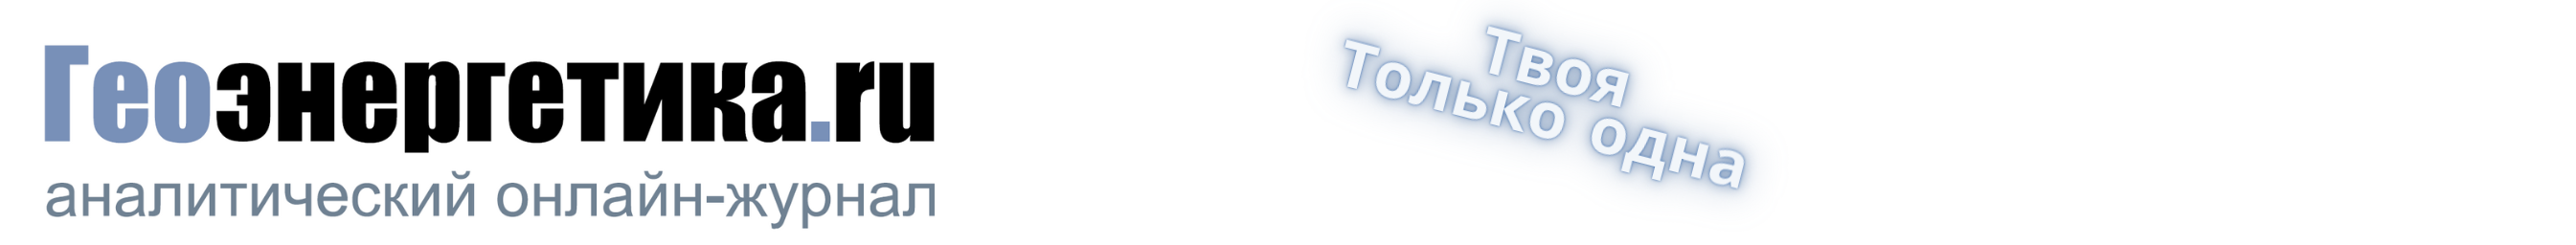 Геоэнергетика - Аналитический онлайн-журнал